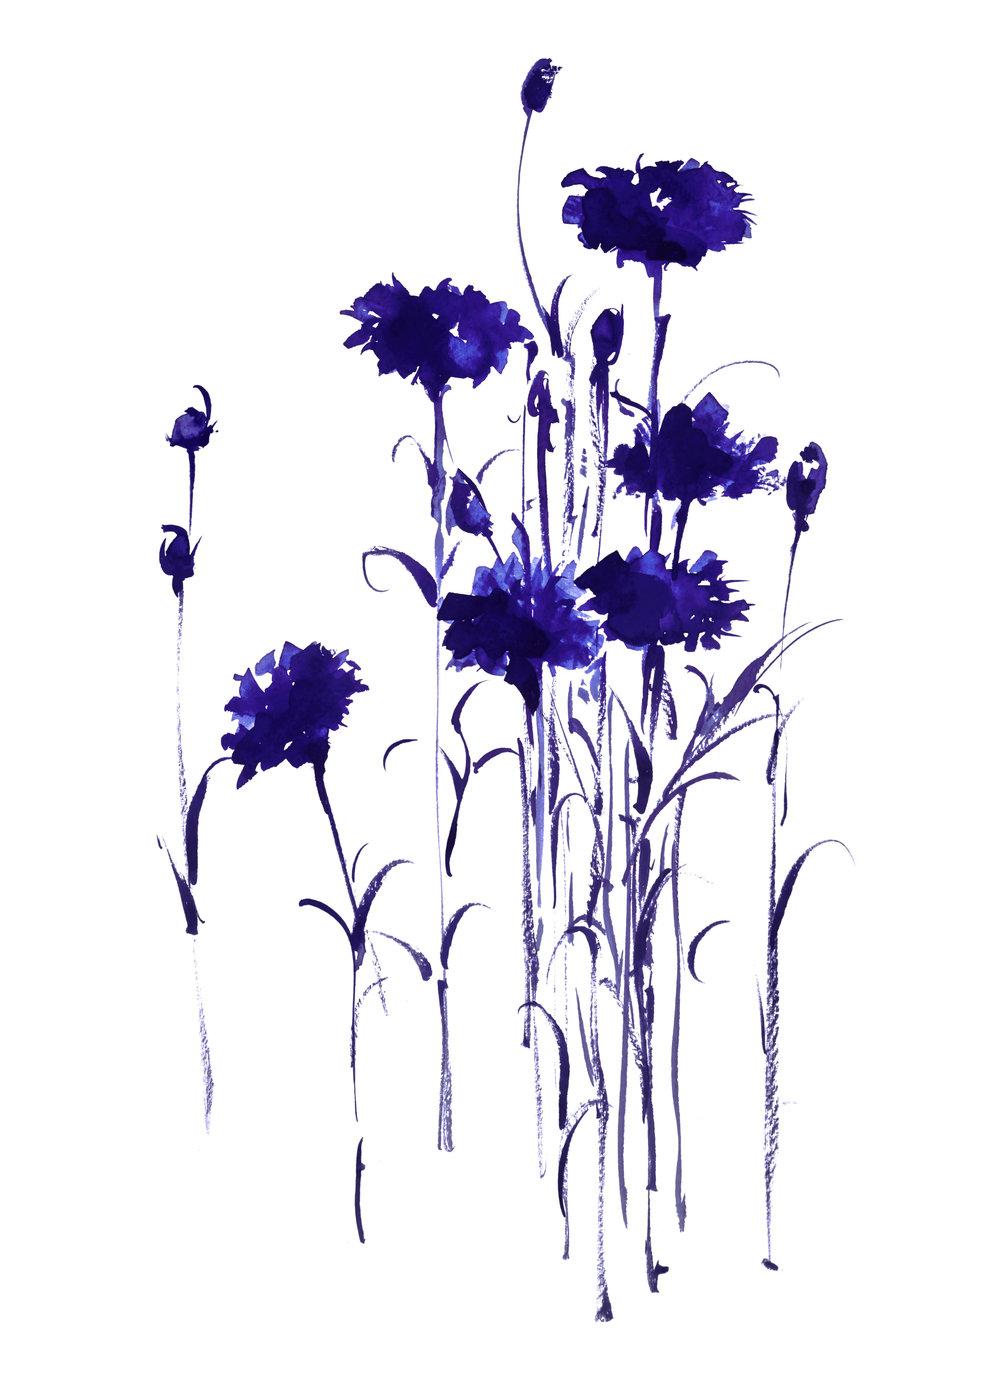 Botanical Study Bachelor Button 4 - Watercolor11 x 14